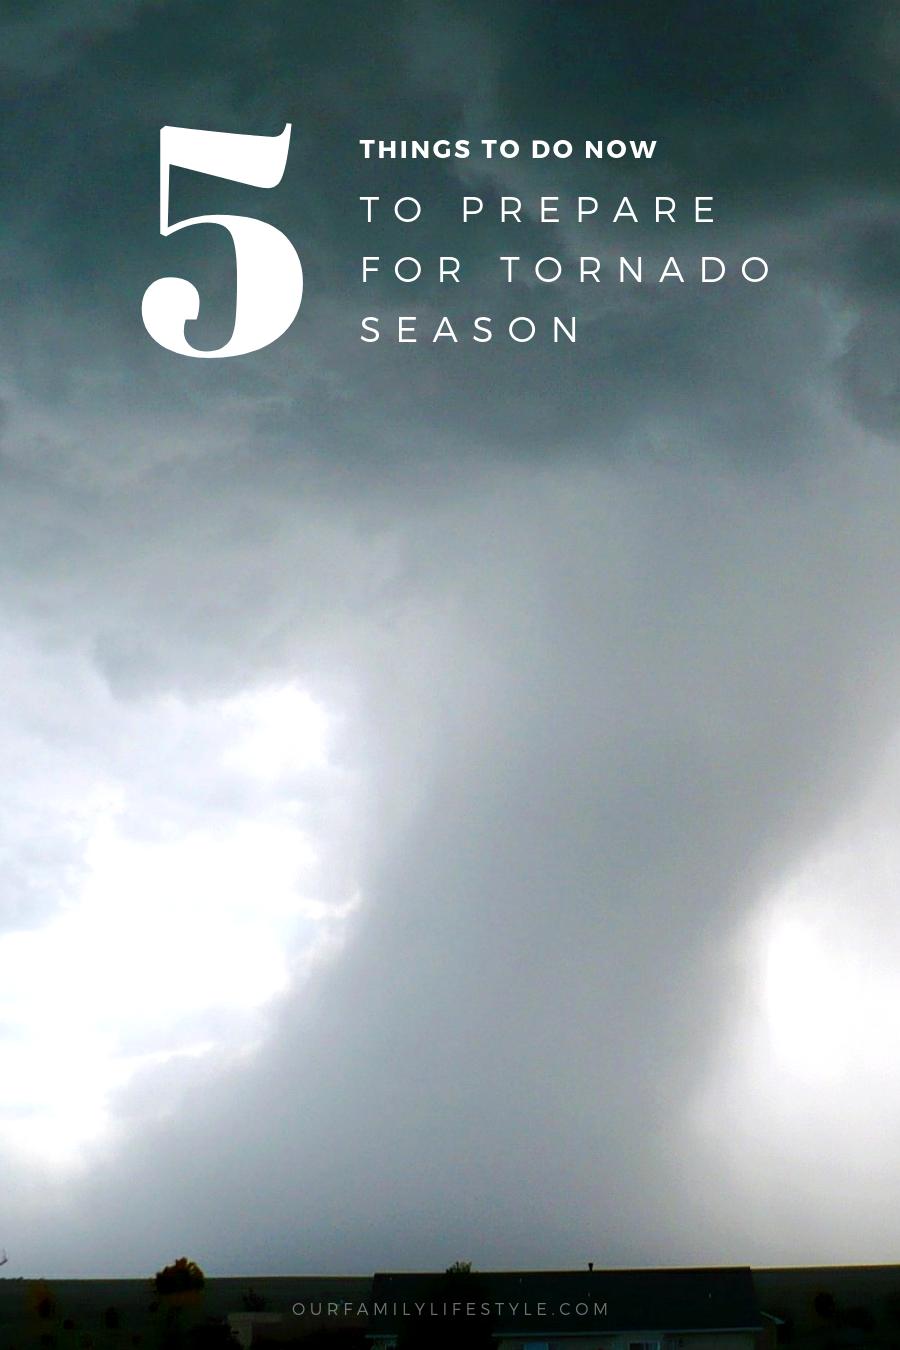 5 Things to do Now to Prepare for Tornado Season